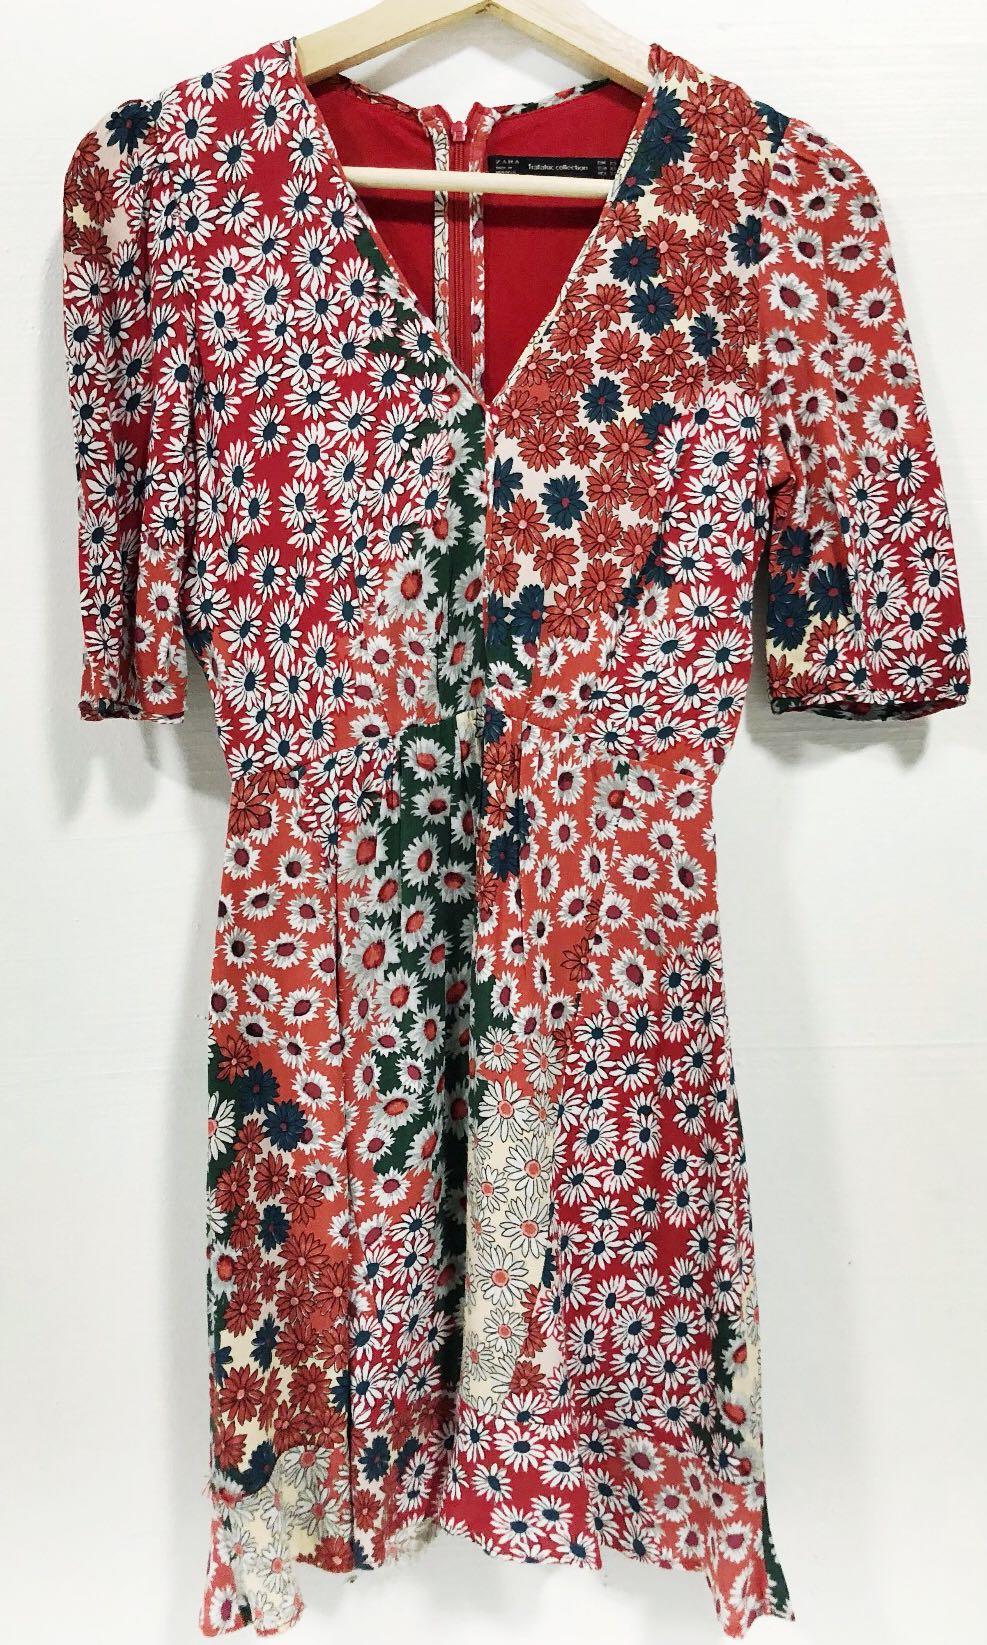 e7ffc49b3ce Zara TRF Floral V-Neck Dress (Authentic)